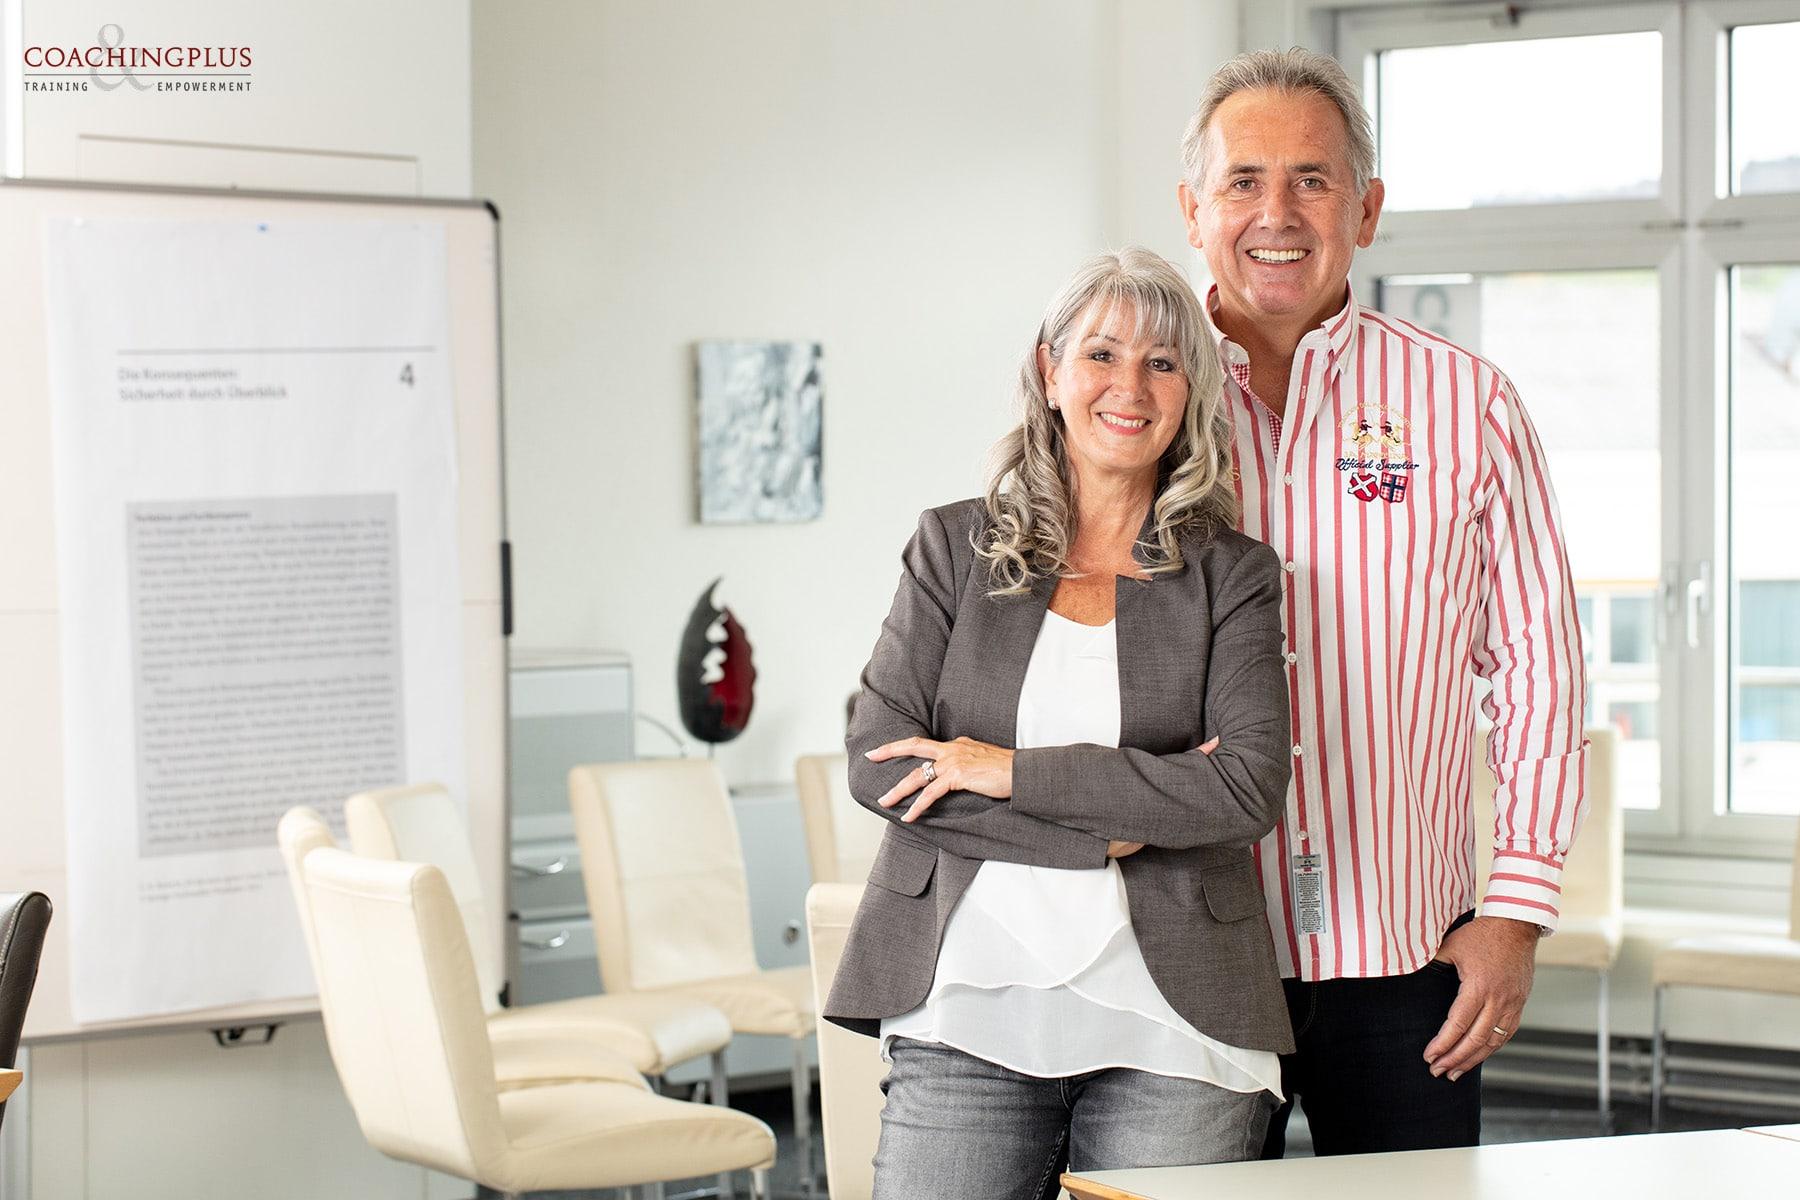 Ruth & Urs R. Bärtschi - Coachingplus